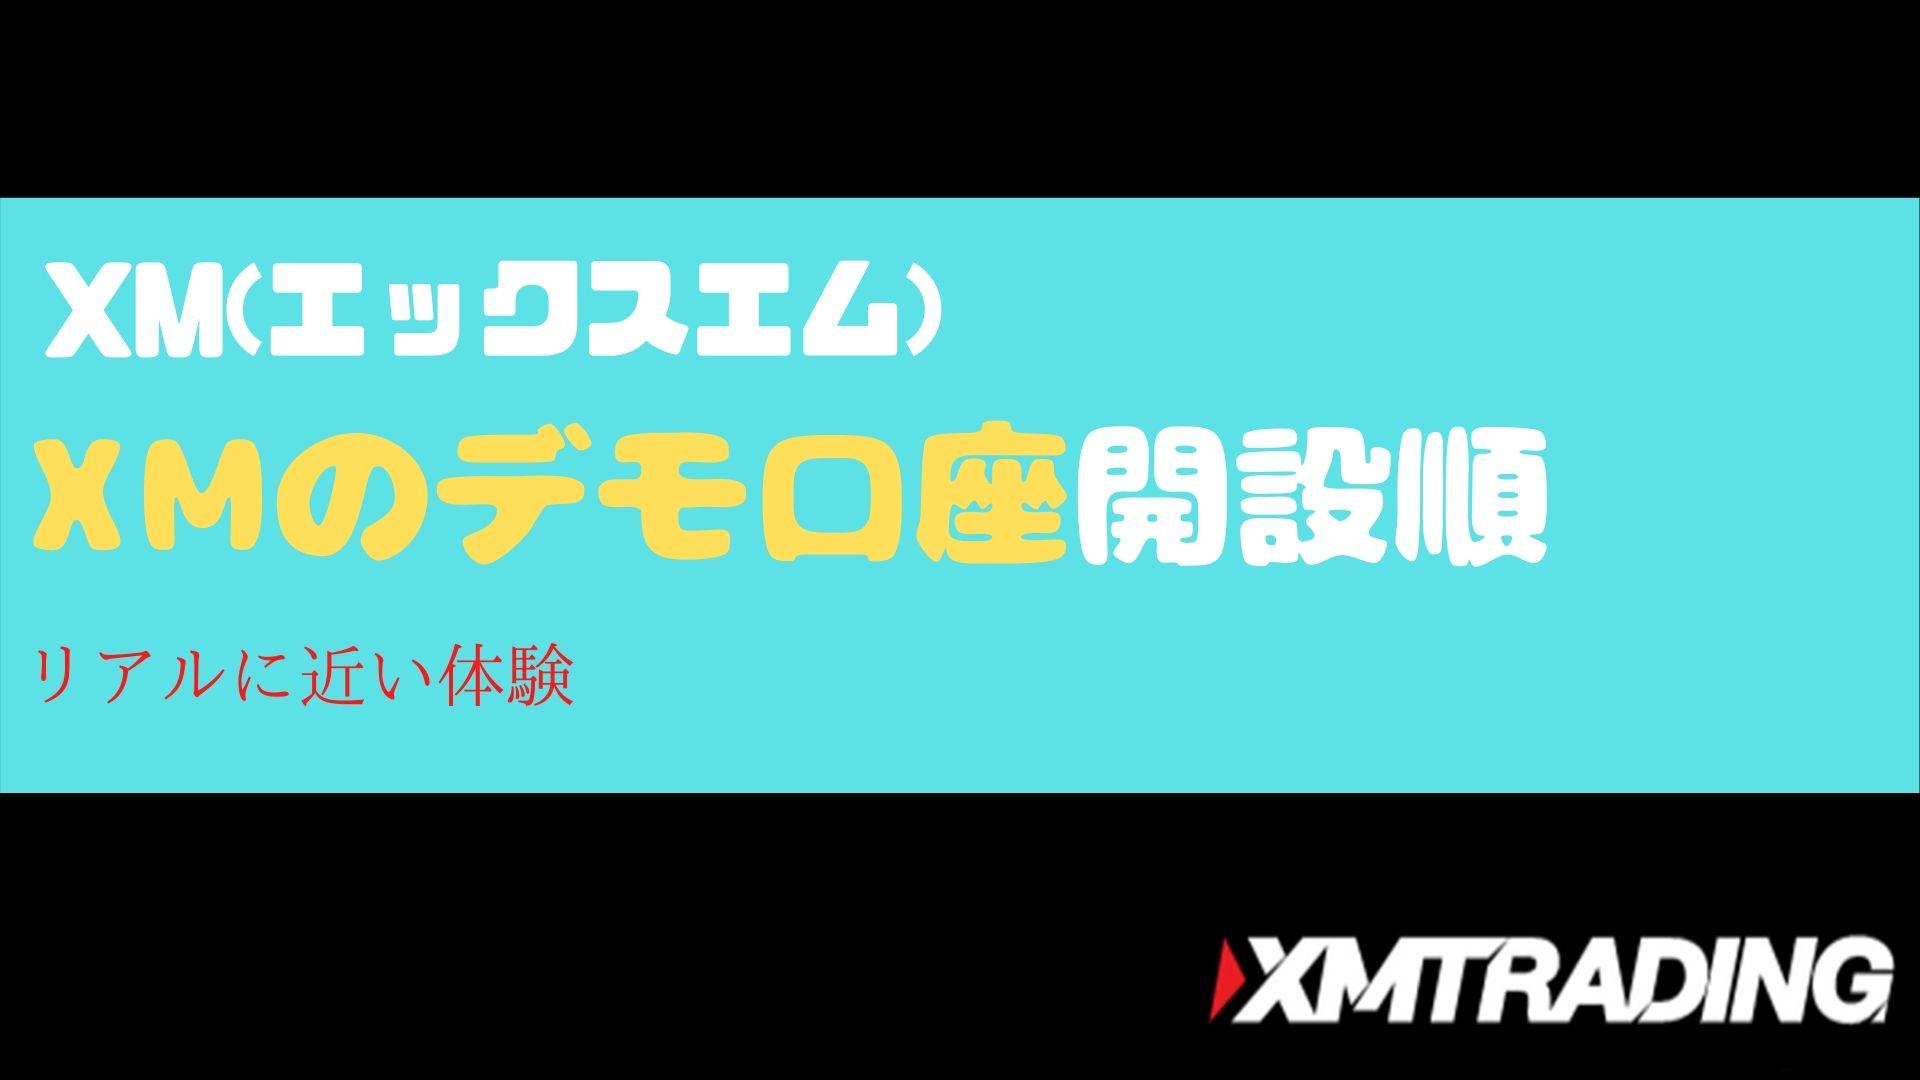 xm-demo-trade-title